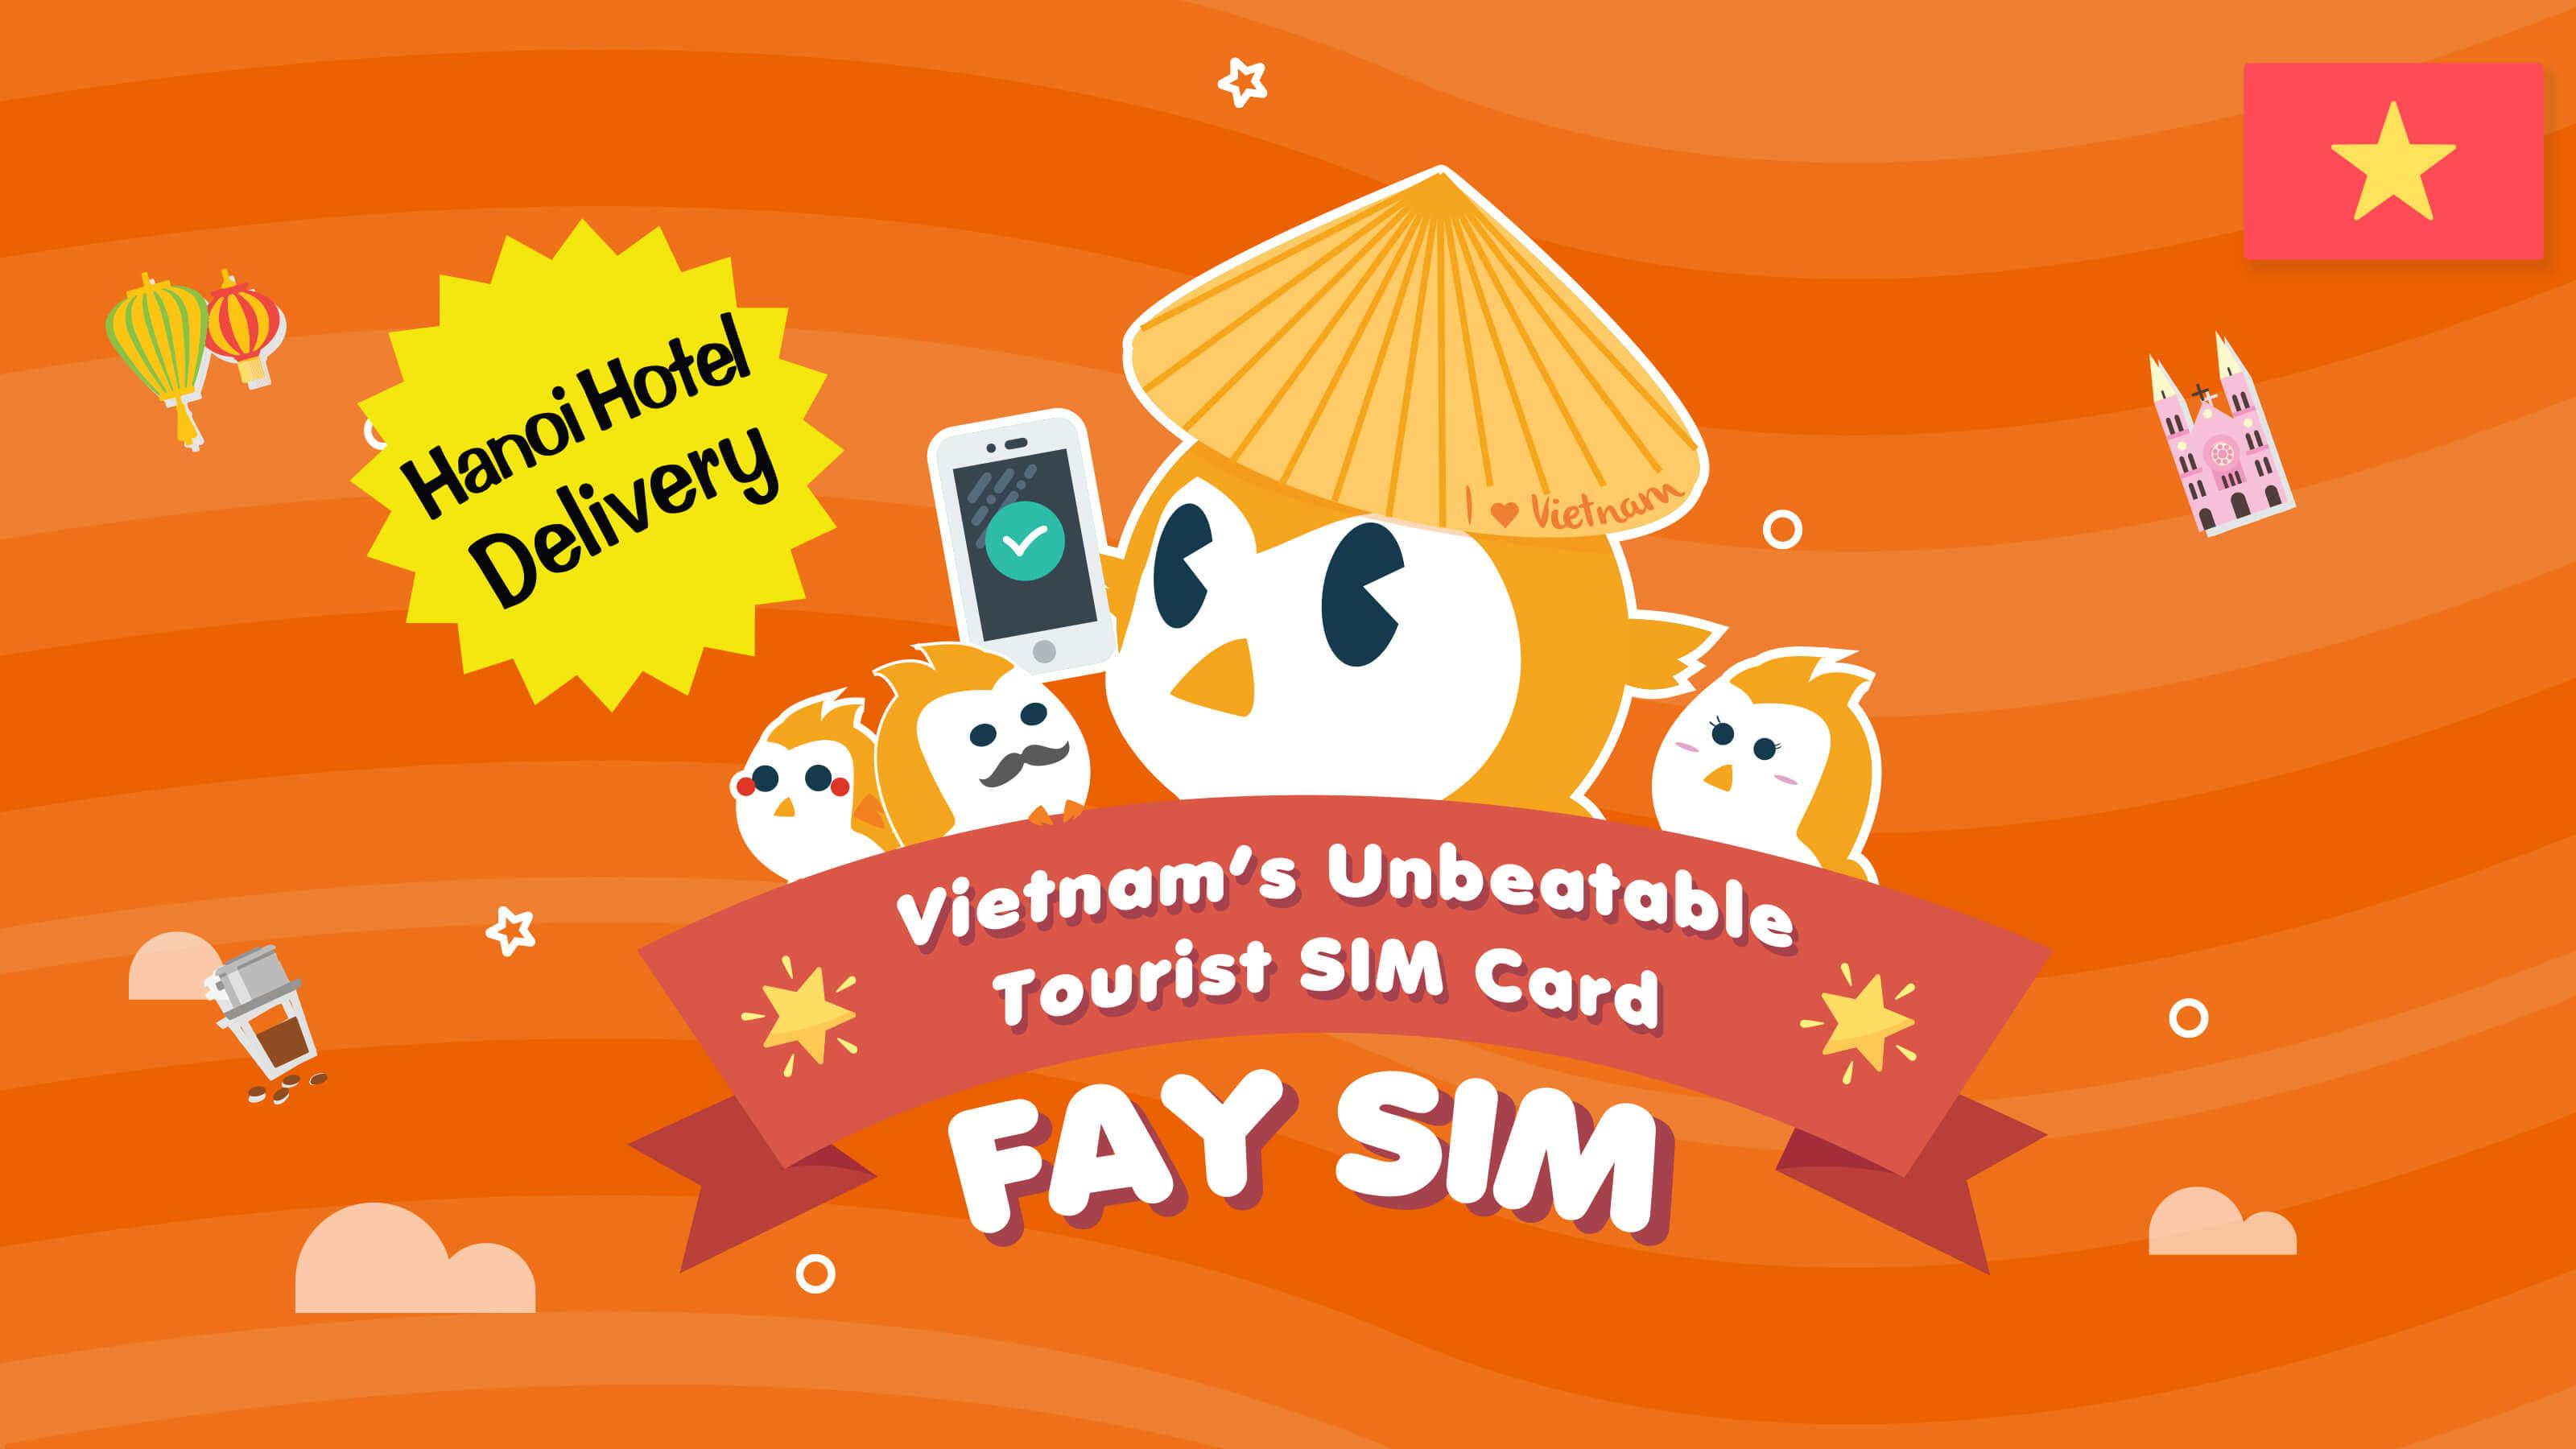 FAY SIM (Hanoi Hotel Delivery)